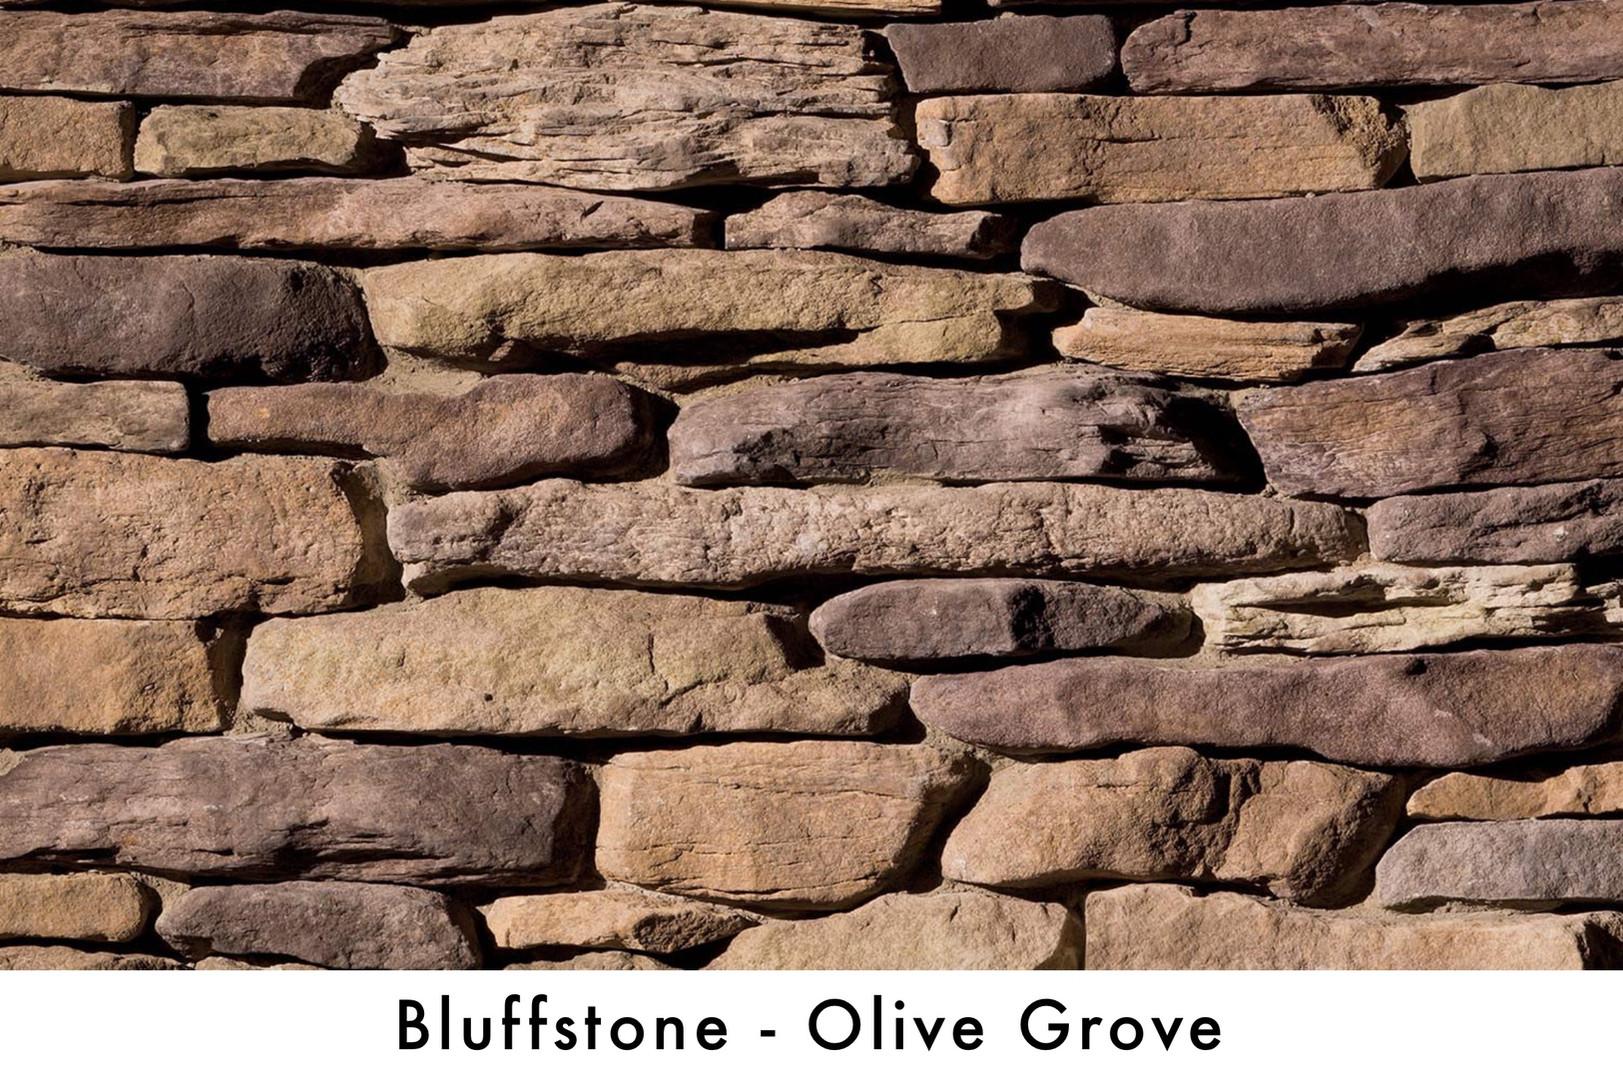 Bluffstone - Olive Grove